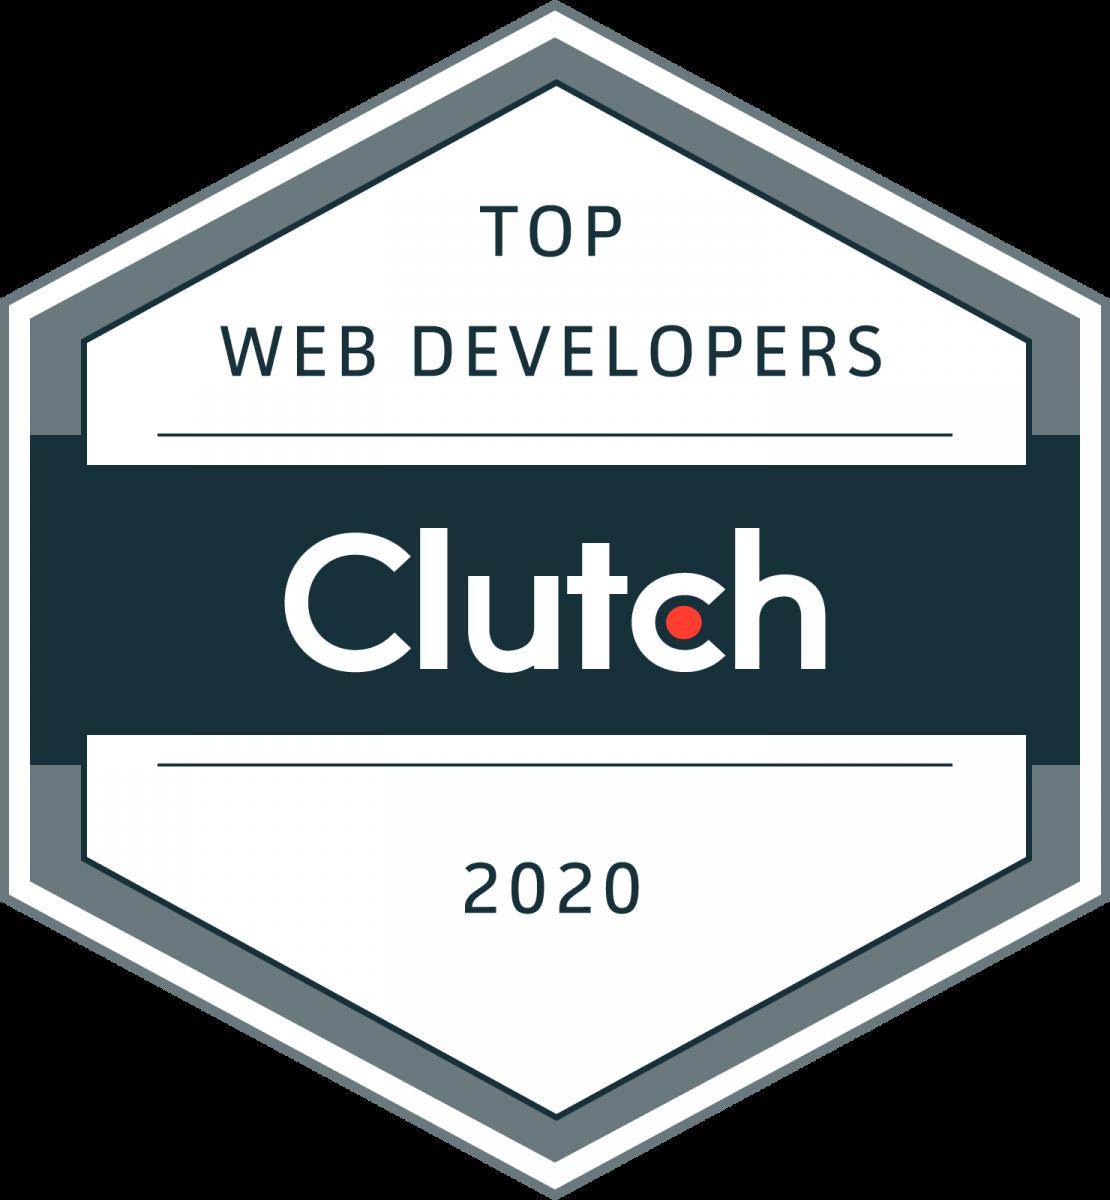 Top Web Developers - Clutch 2020